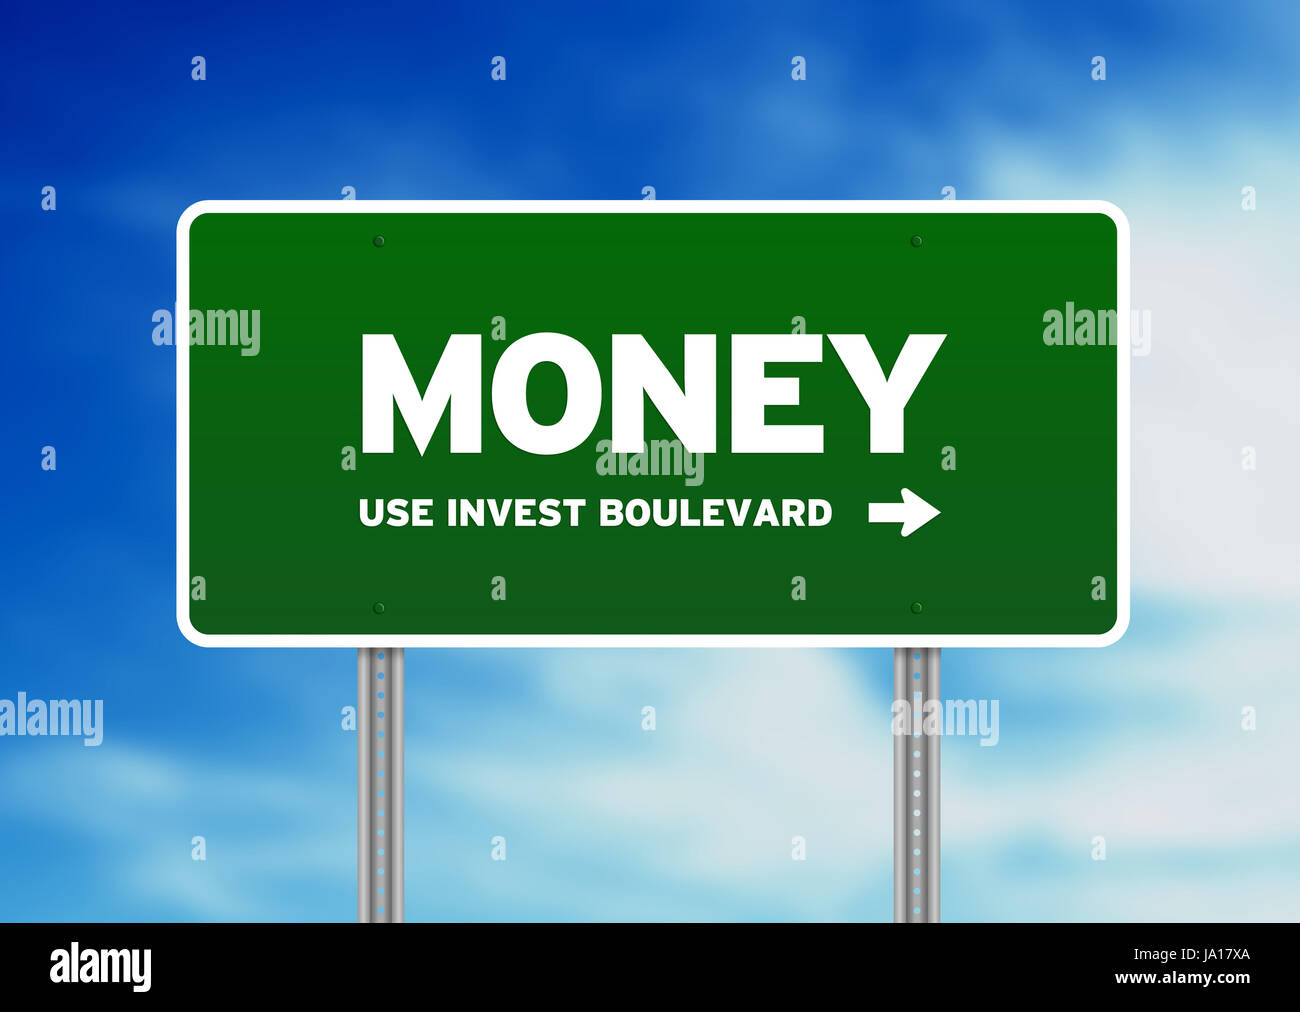 motorway, highway, sign, signal, traffic sign, road, billboard, street, bank, - Stock Image